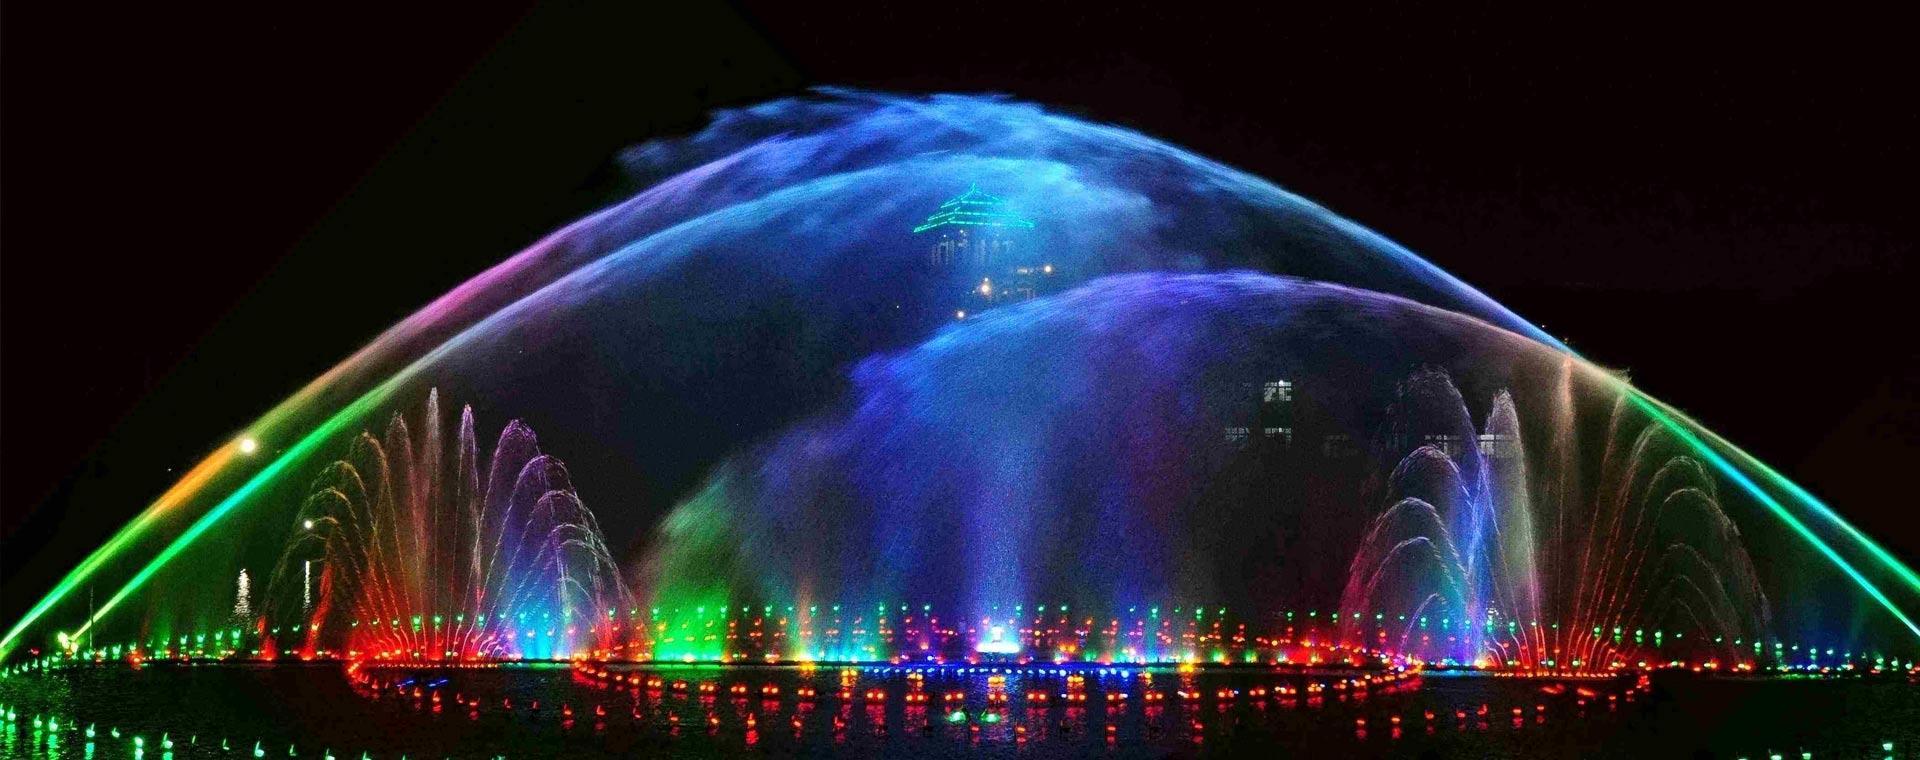 噴泉004